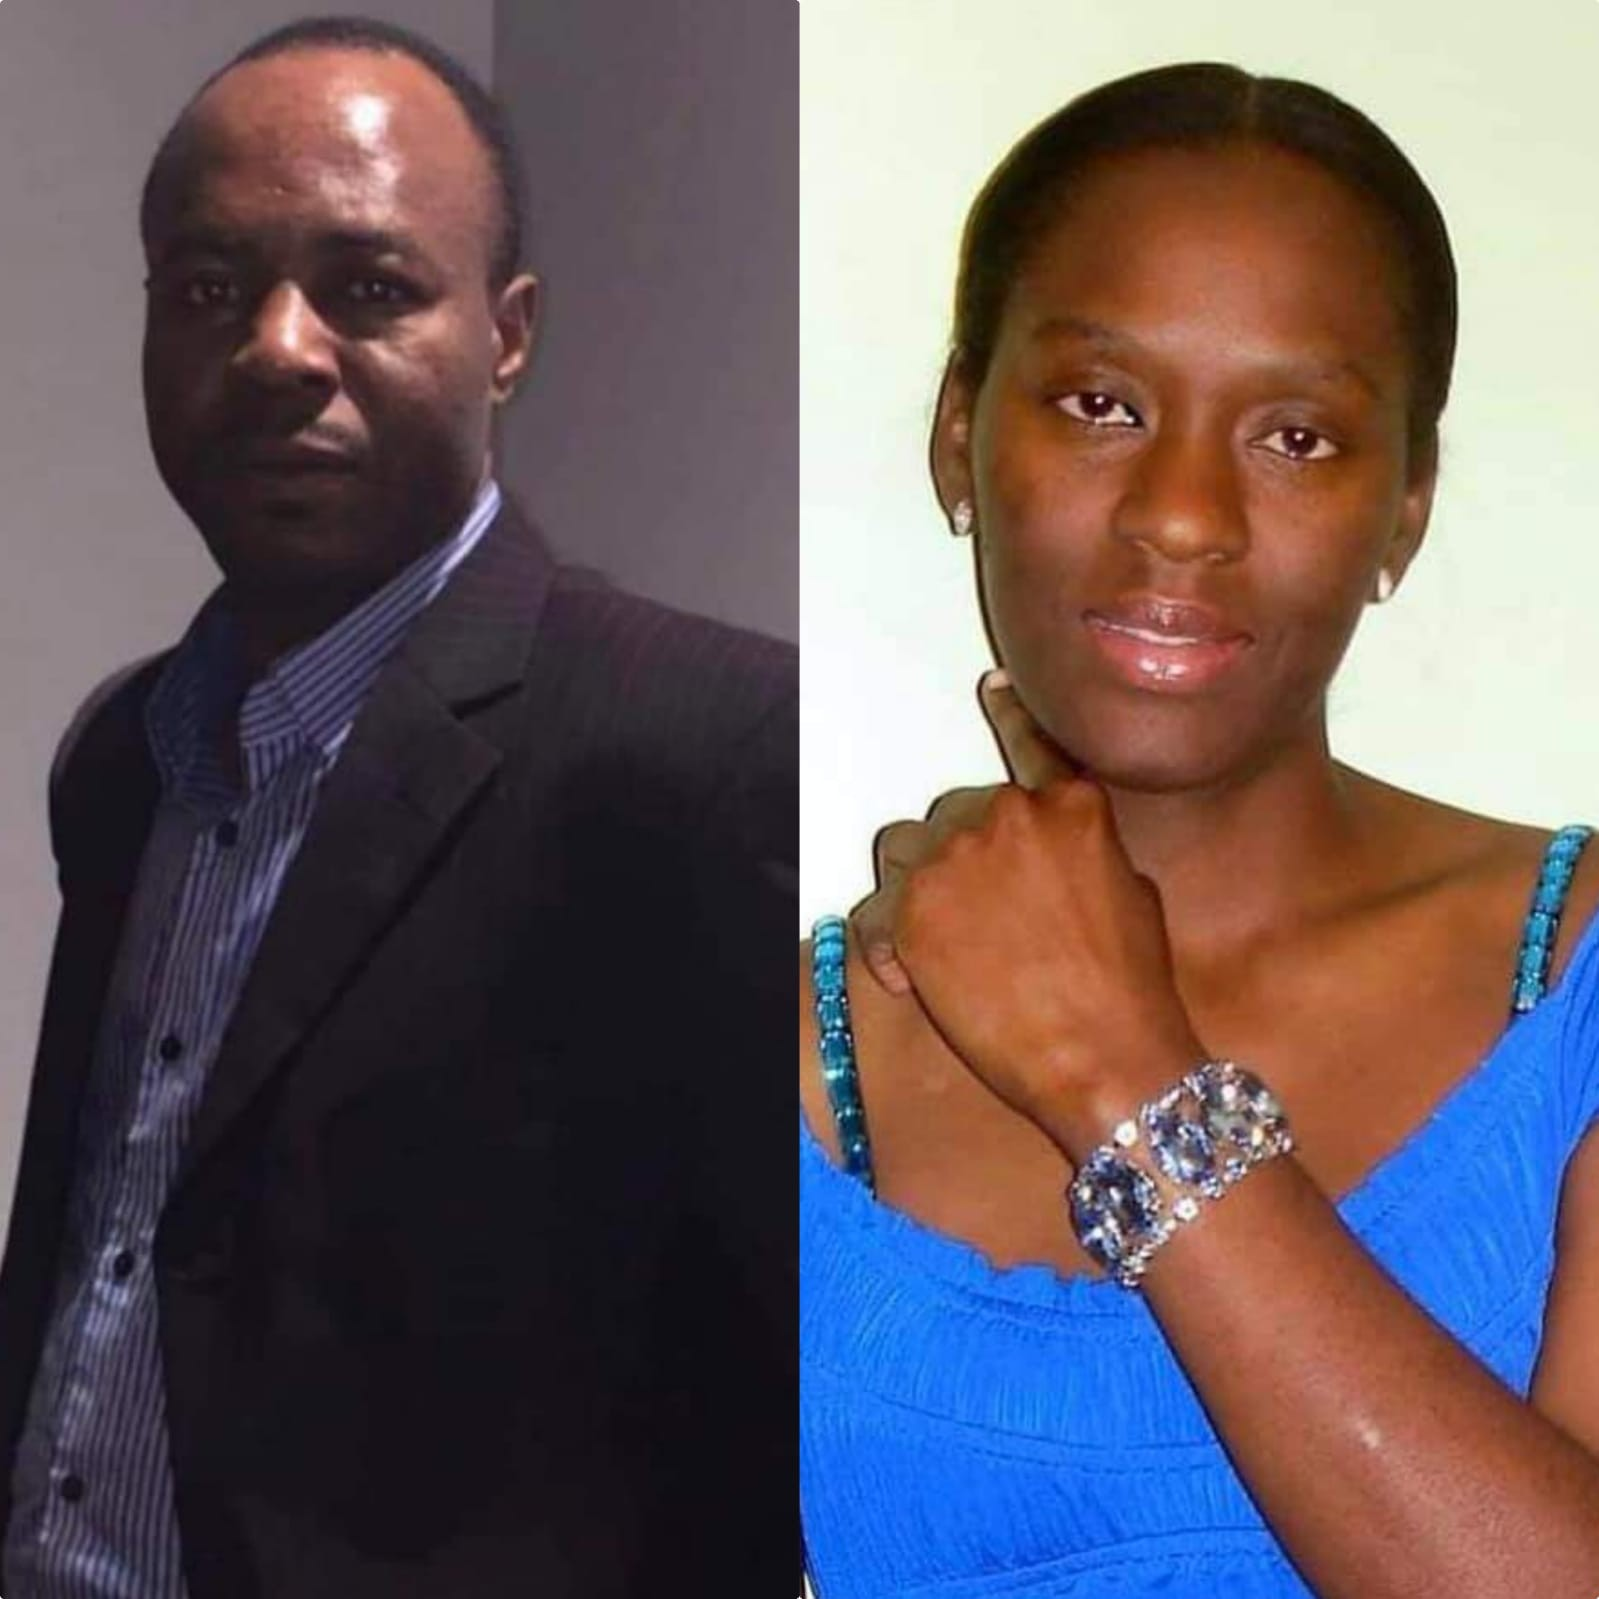 USA/Cincinnati : Tragédie familiale. Un camerounais tue son ex-femme et se tue